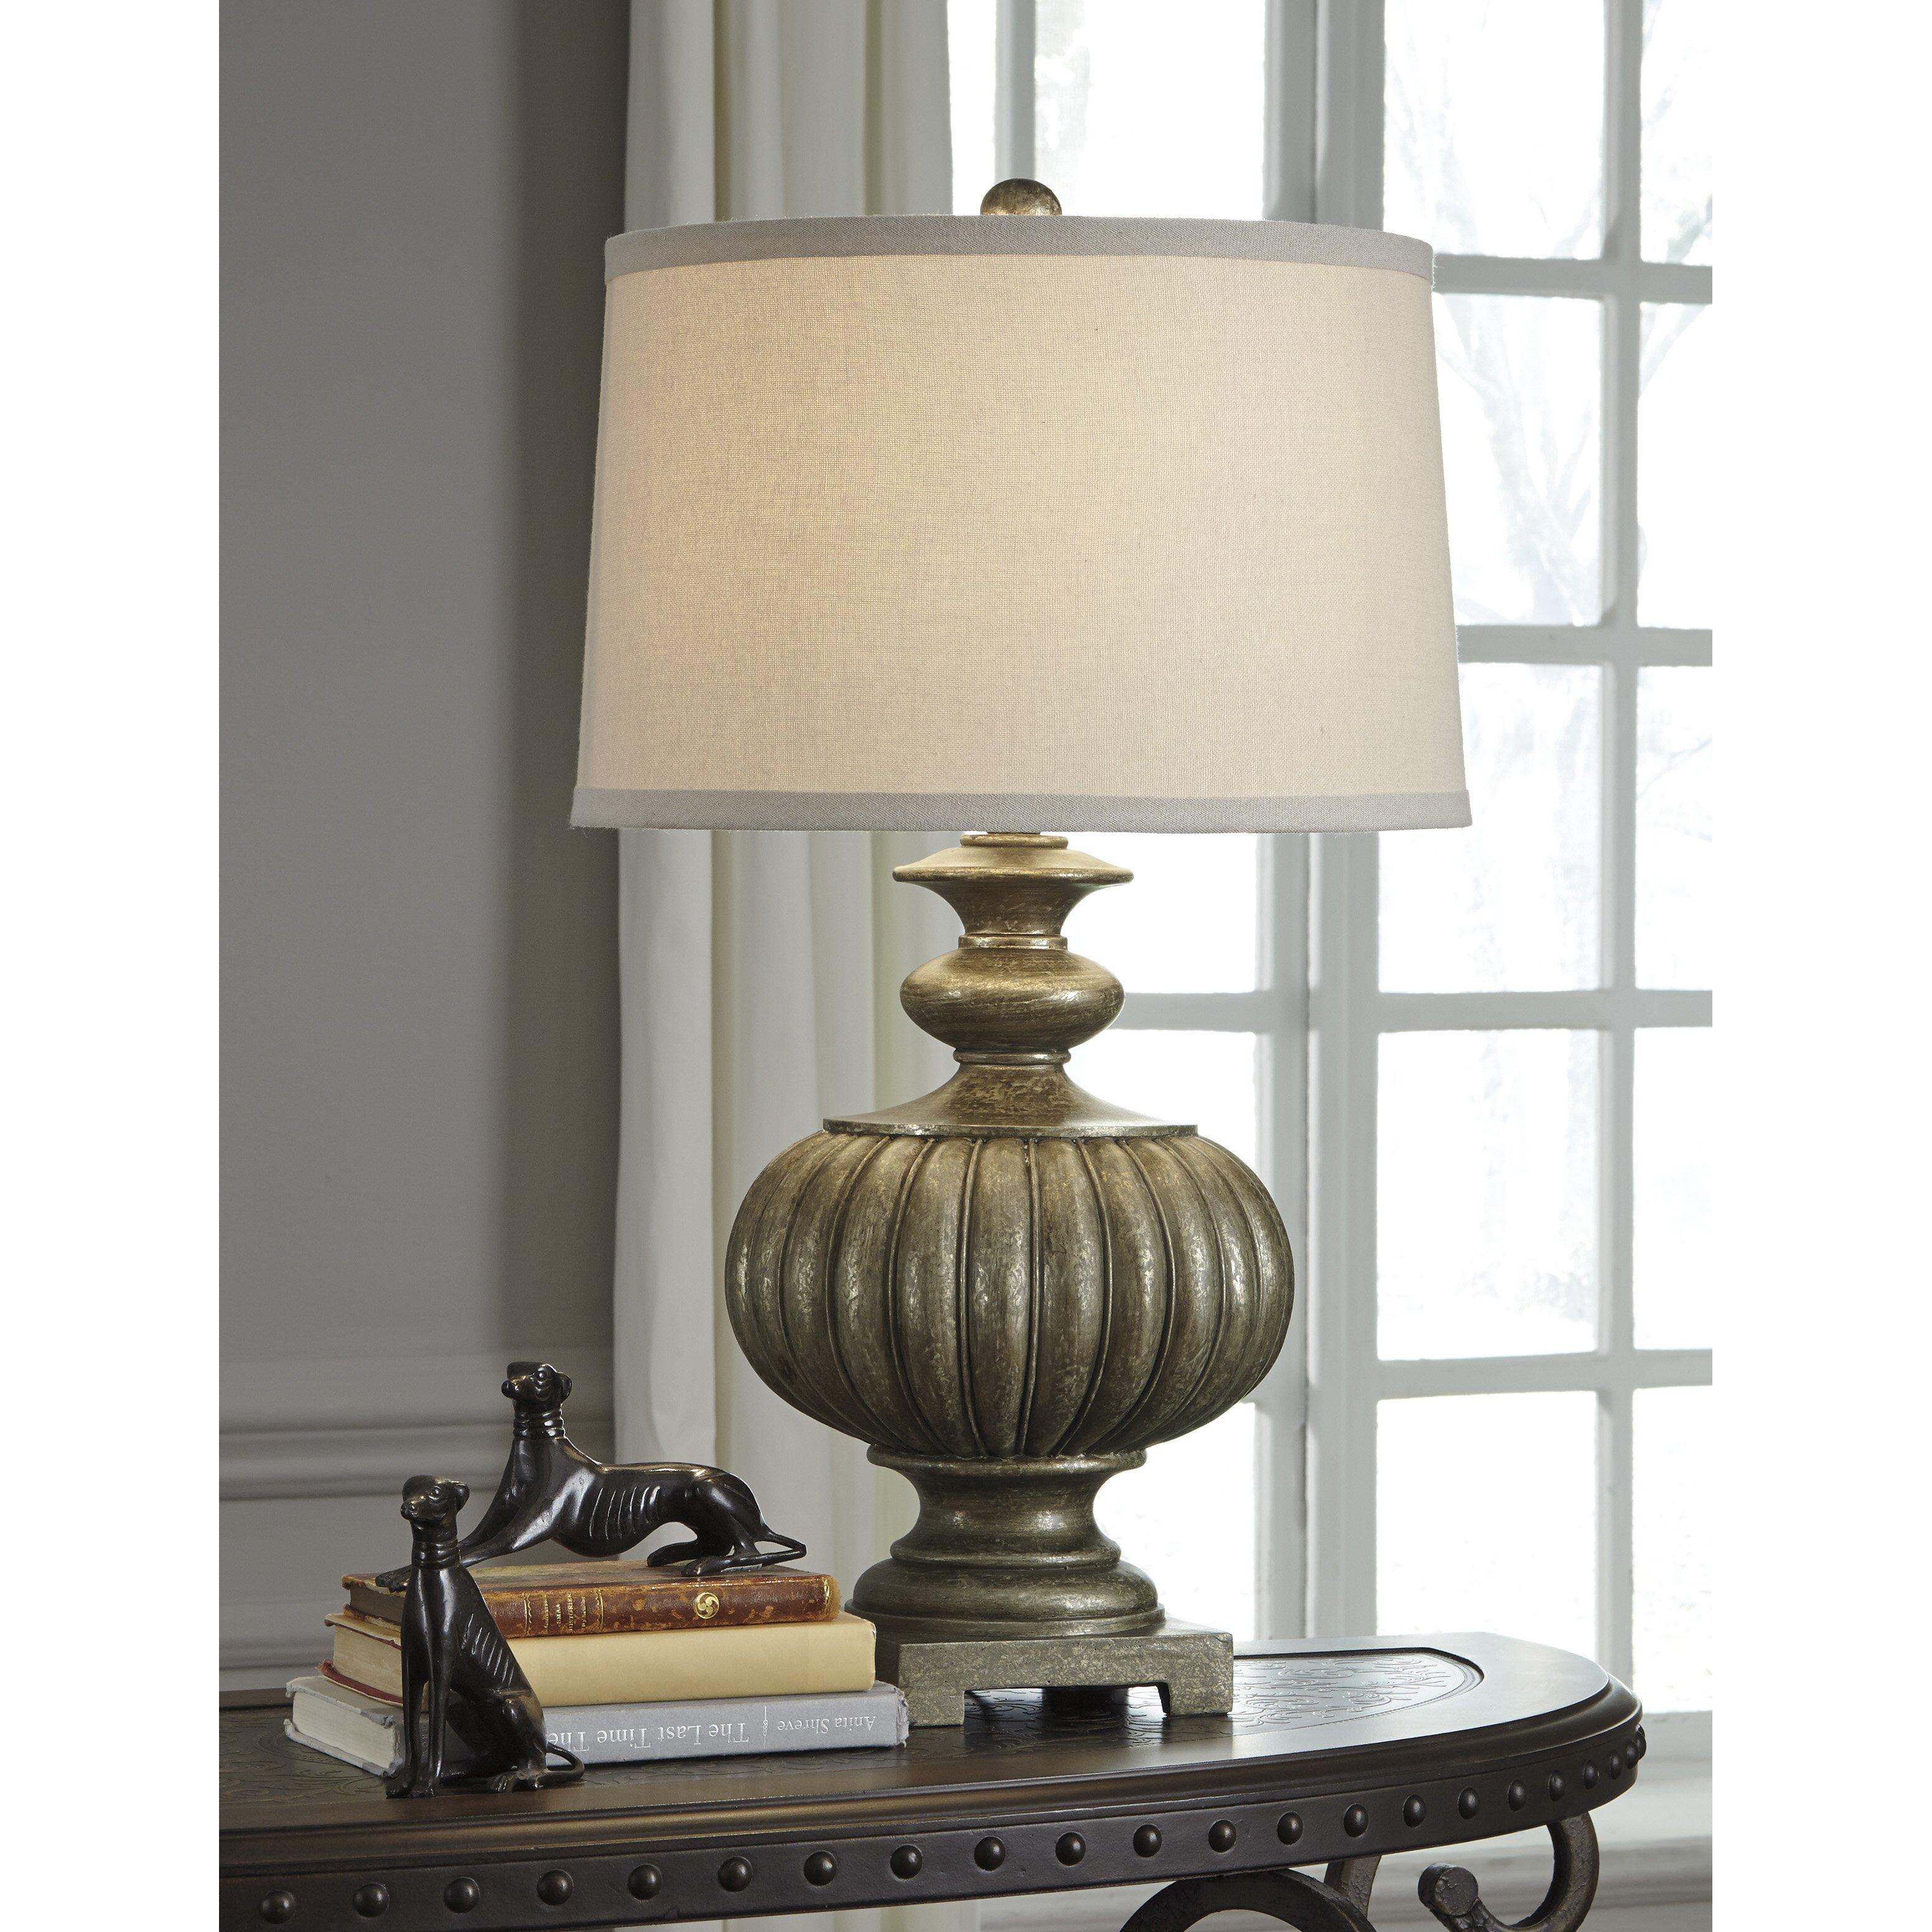 "Laurel Foundry Modern Farmhouse Blancheville 28 5"" Table Lamp & Revi"